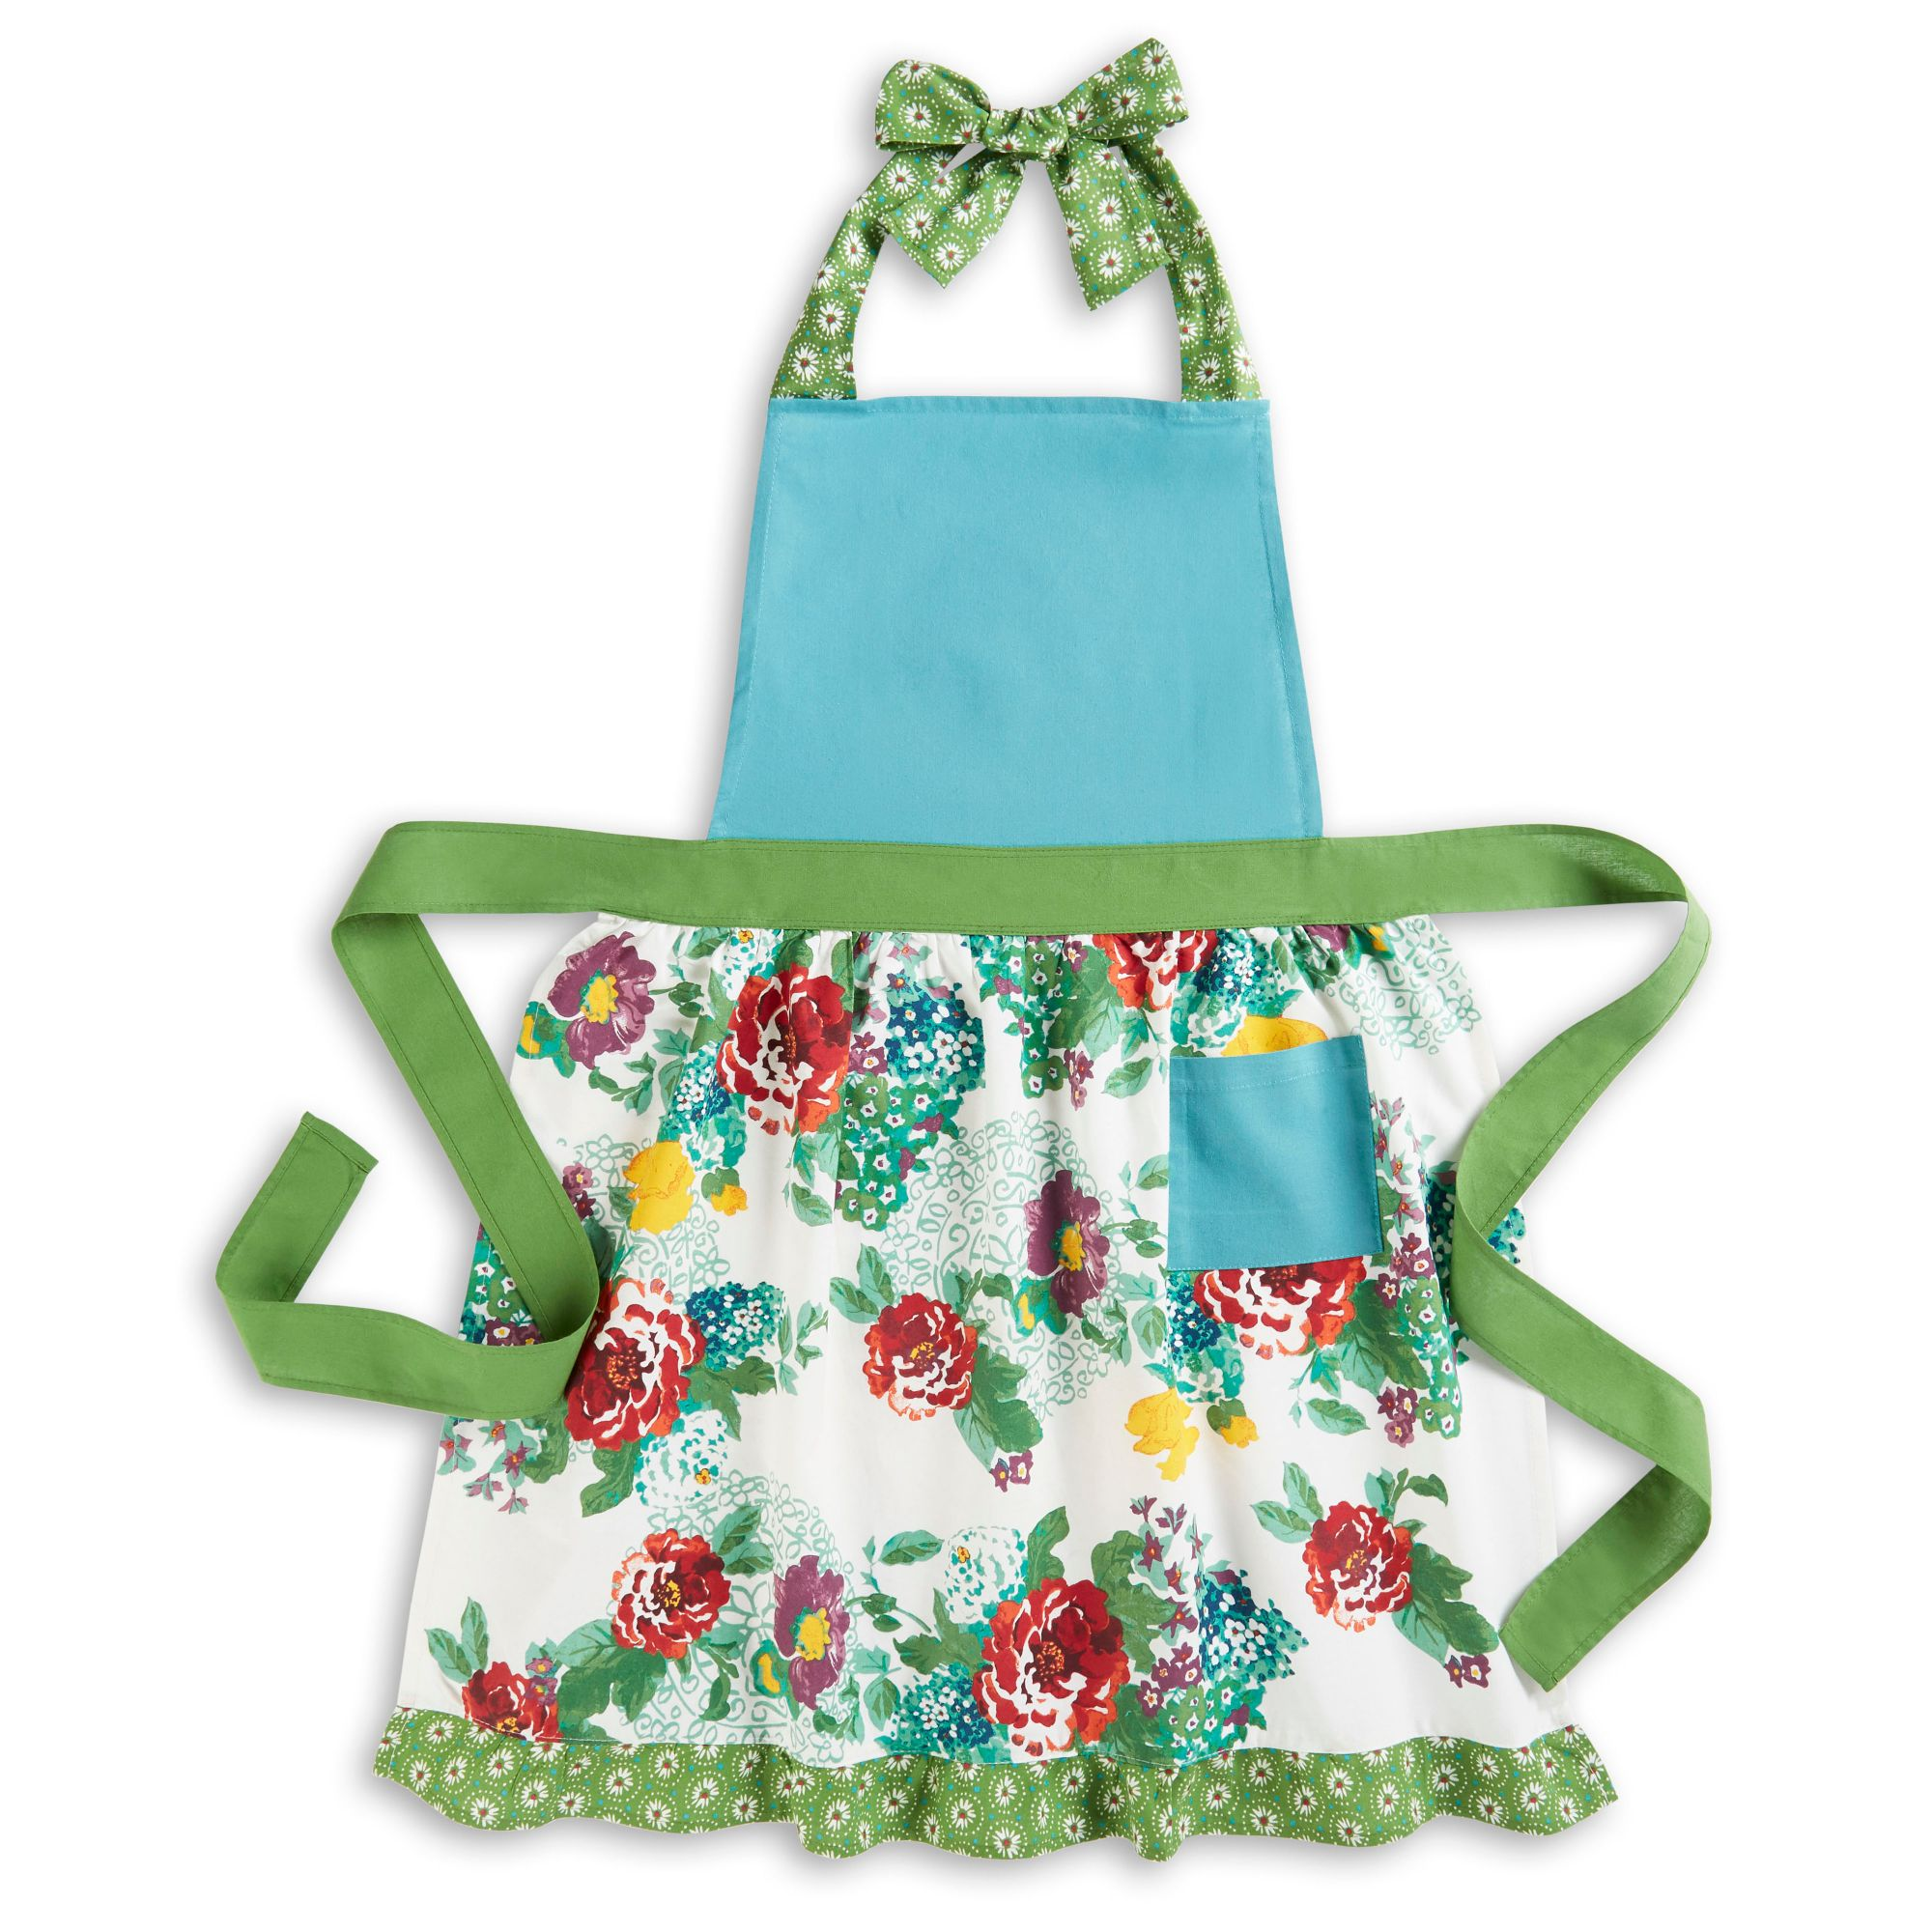 Girls Apron Flower Apron Cooking Apron Apron Simple Apron Pioneer Apron Woman/'s Apron